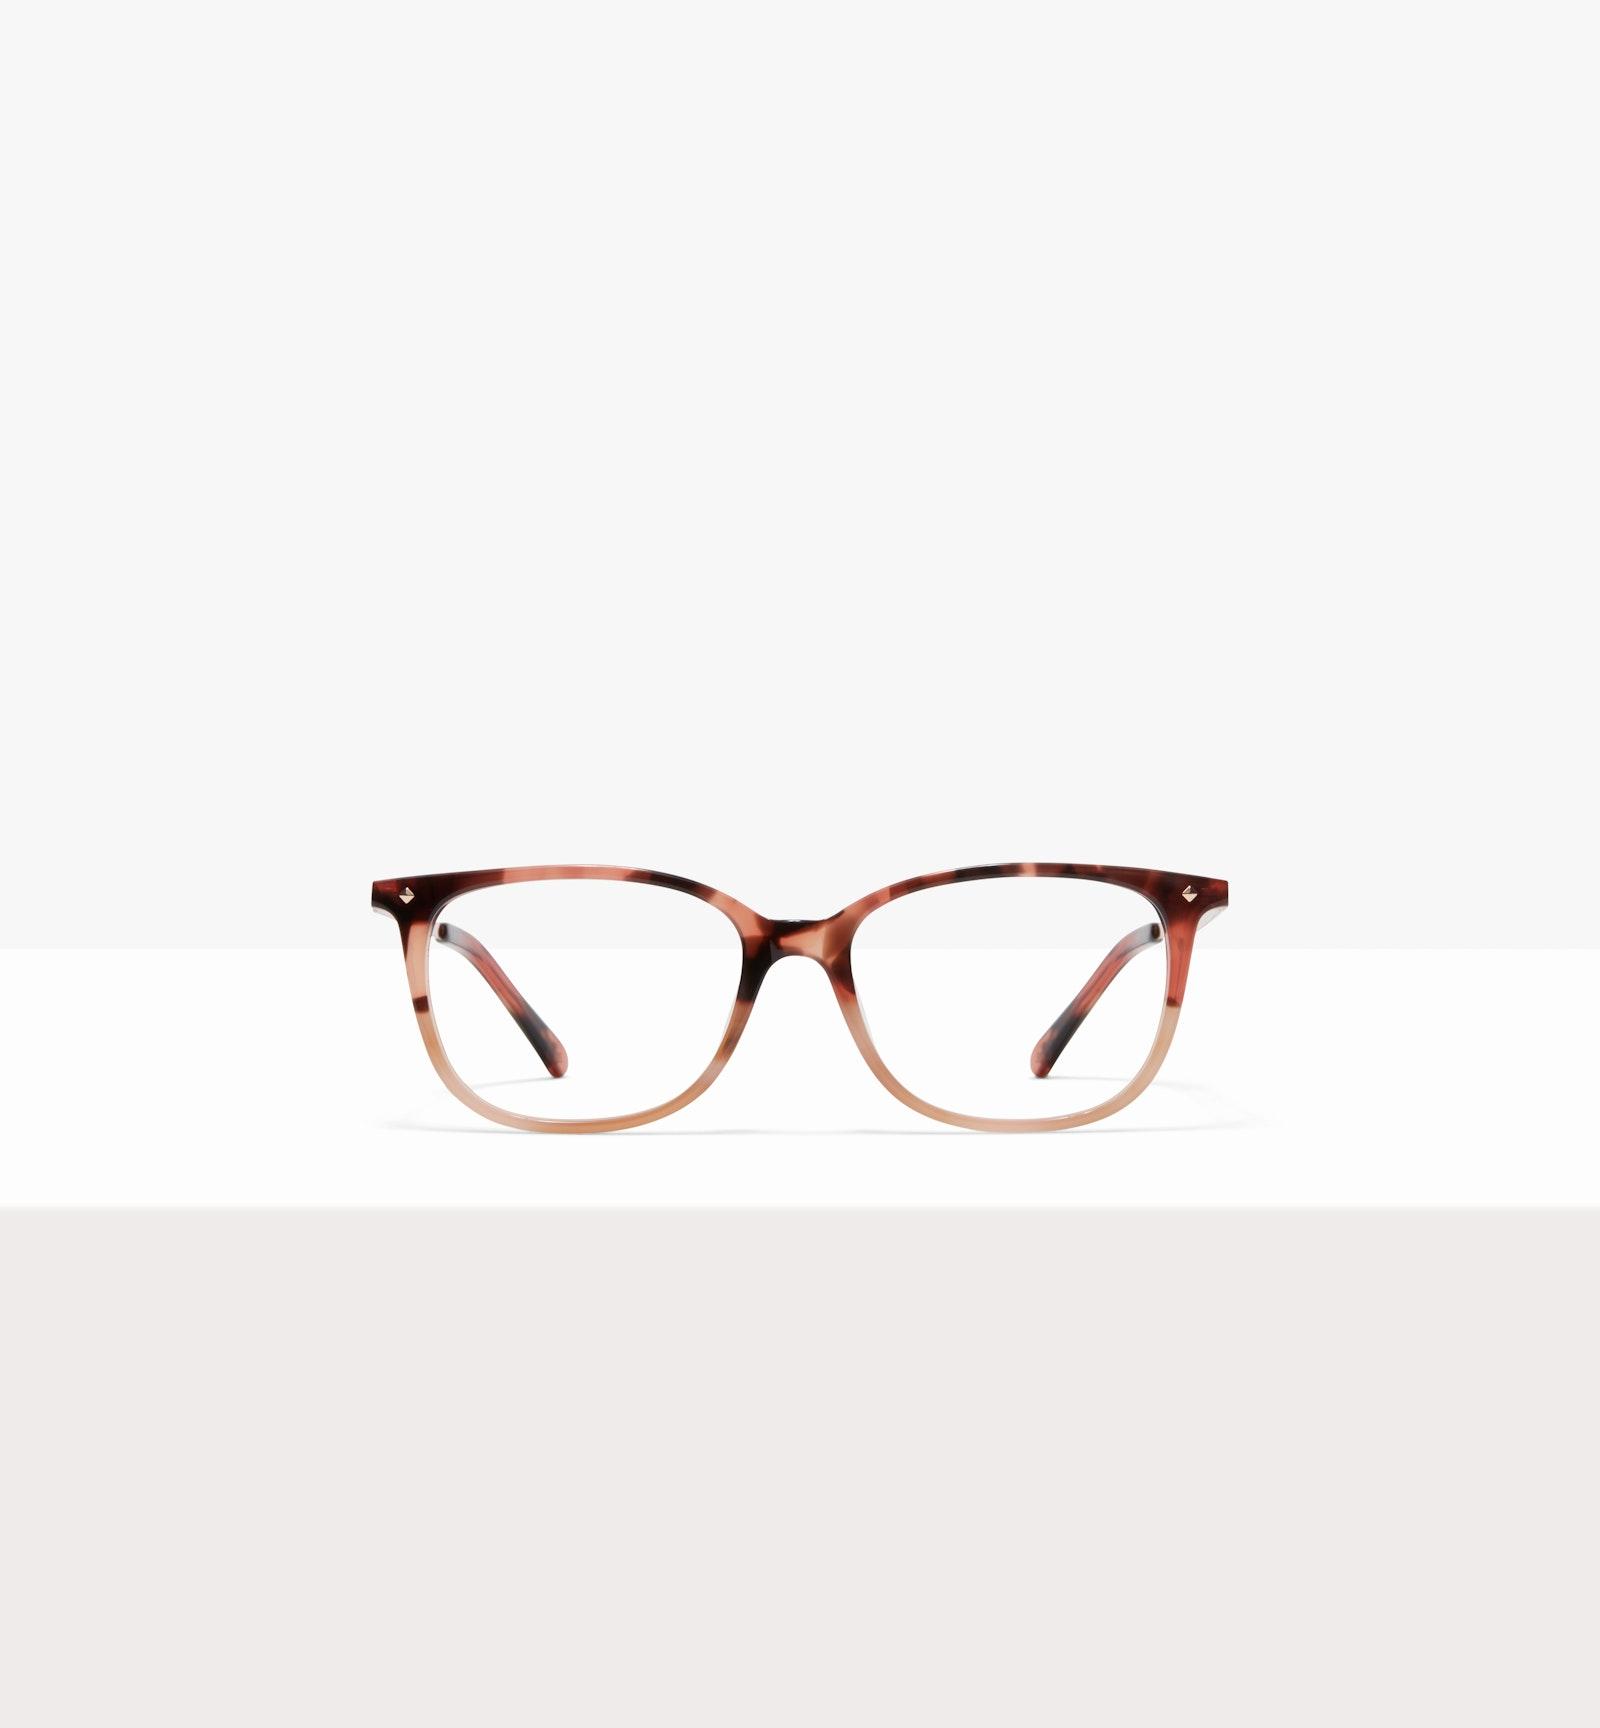 Affordable Fashion Glasses Rectangle Square Eyeglasses Women Refine M Two Tone Pink Tort